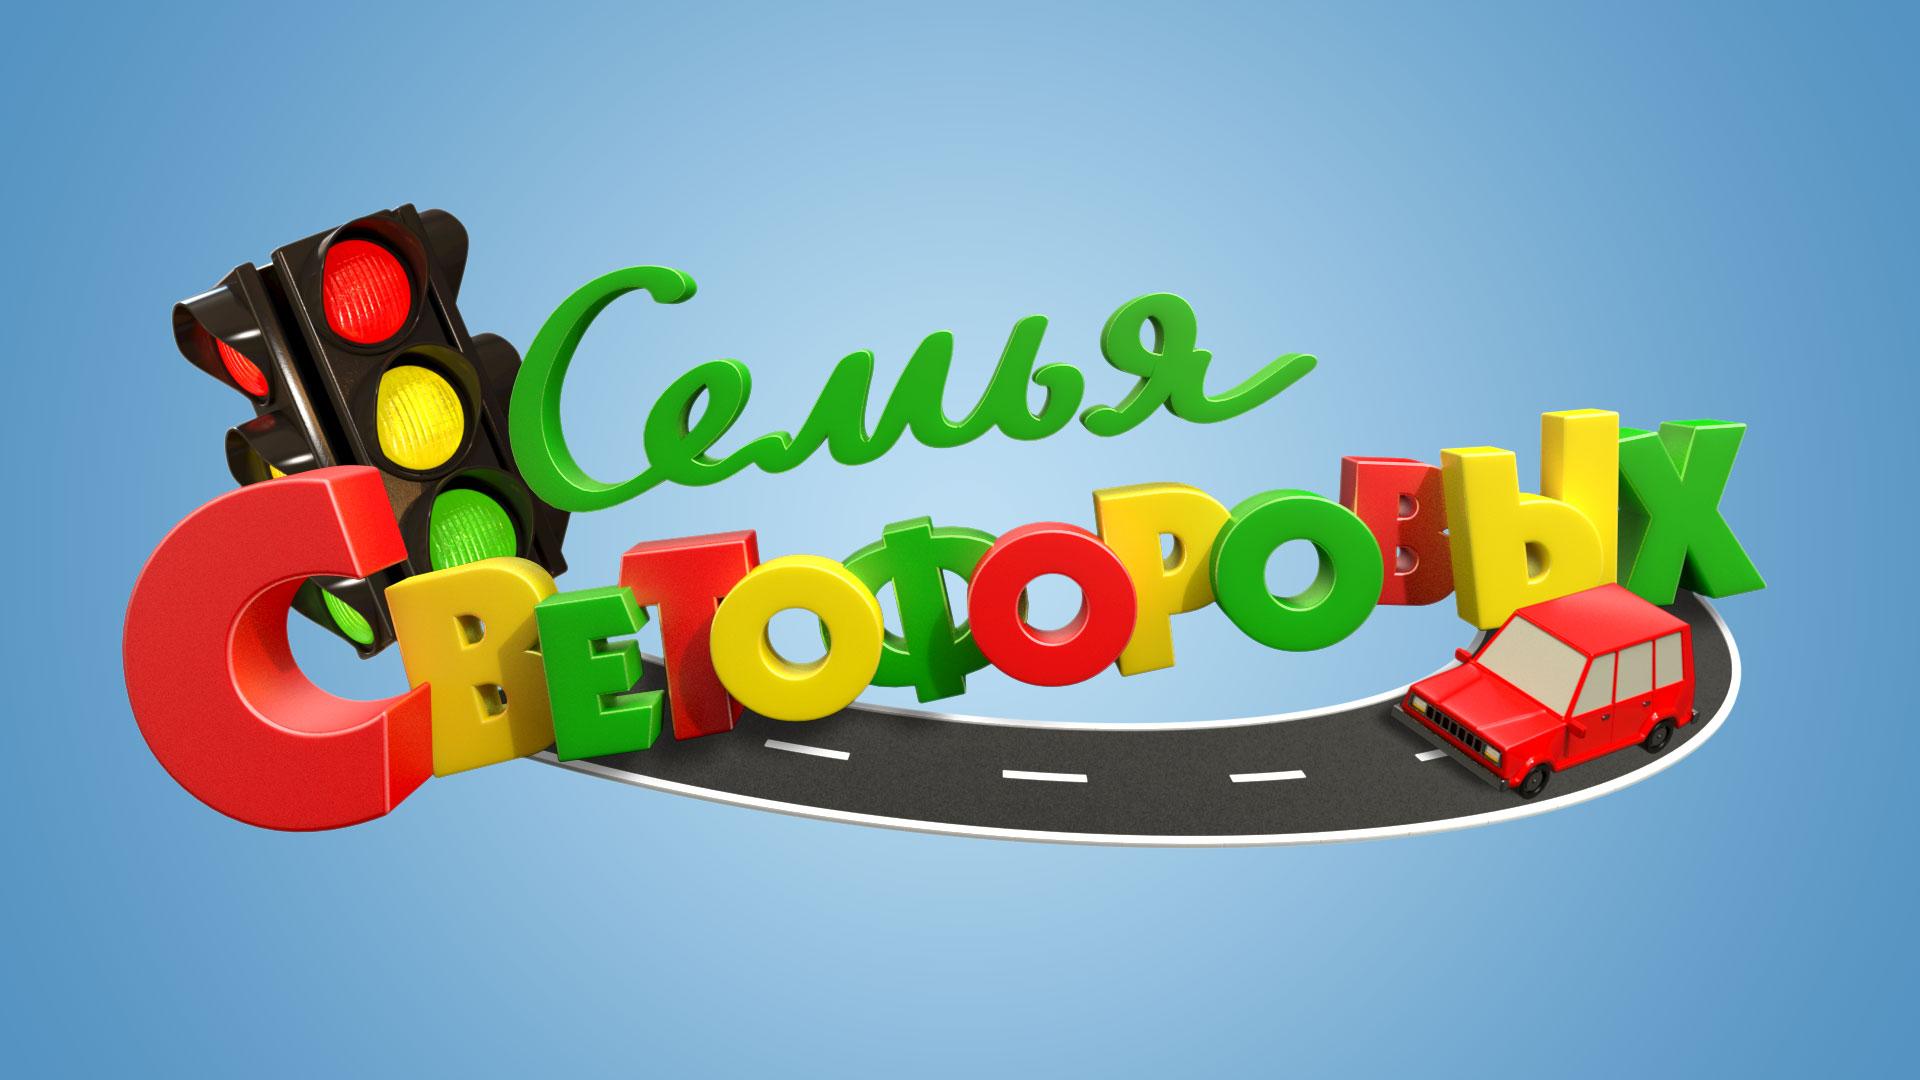 http://dolschool.ucoz.ru/Images/logo3.jpg